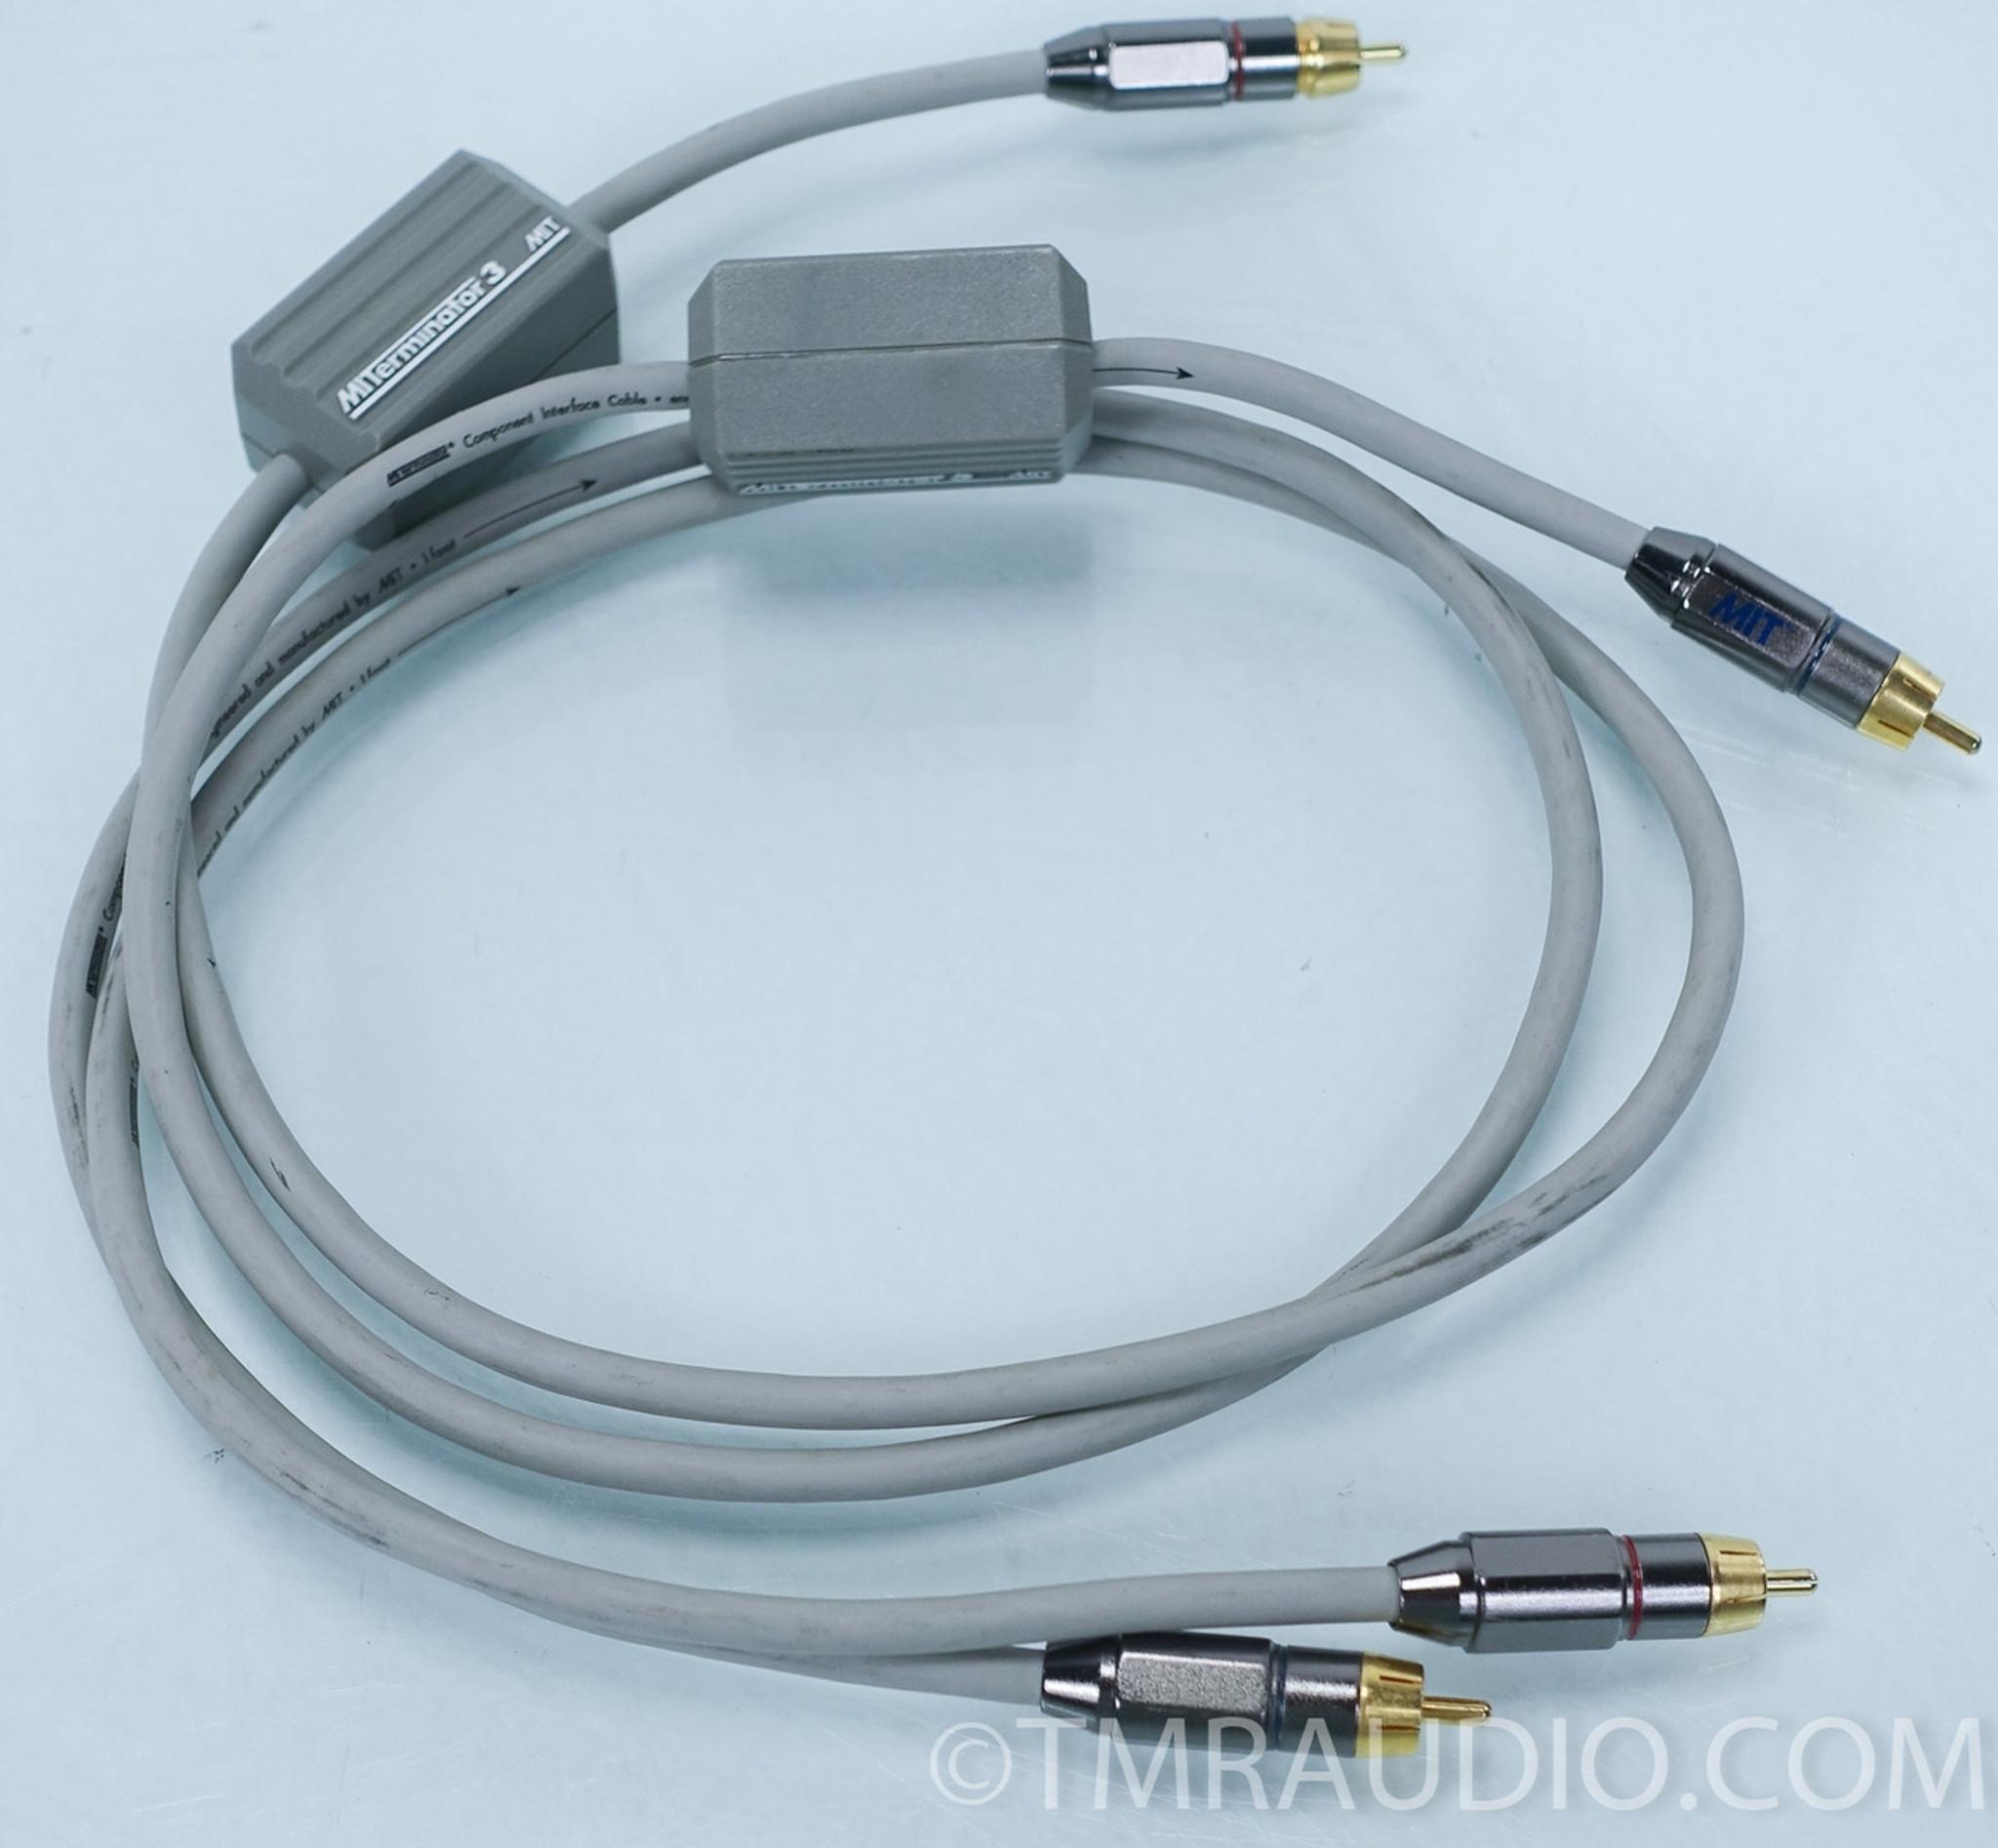 MIT Terminator 3 Interconnect 2 Meter Cables